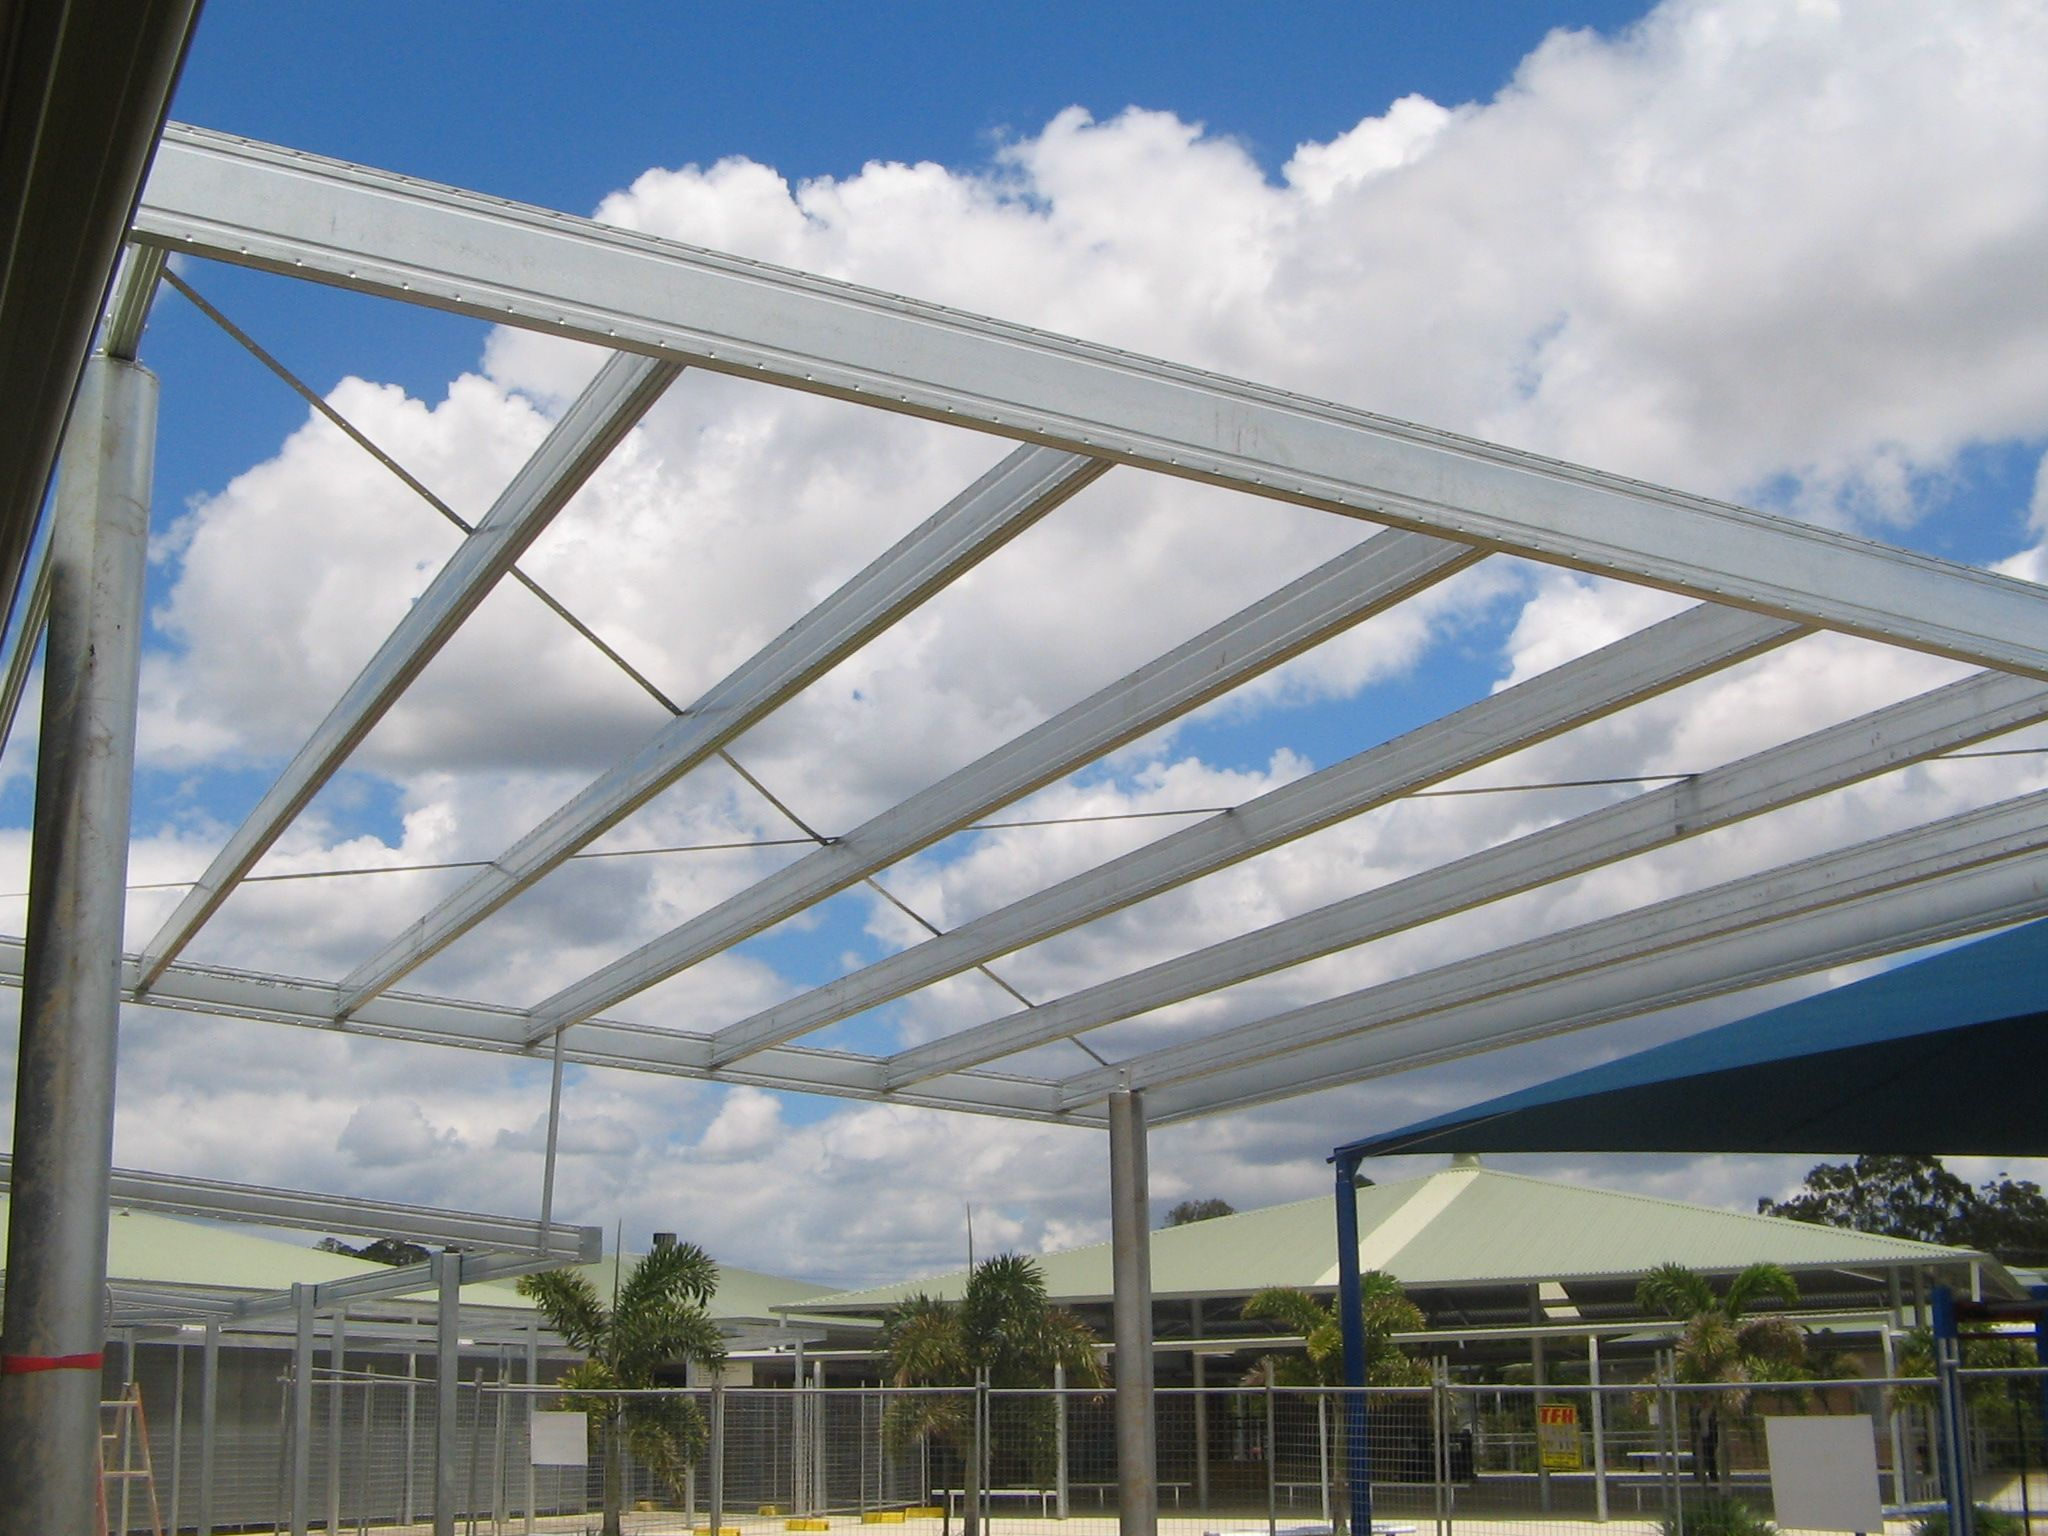 Skillion Roof Using Boxspan Steel Beams Skillion Roof Steel Beams Roof Framing